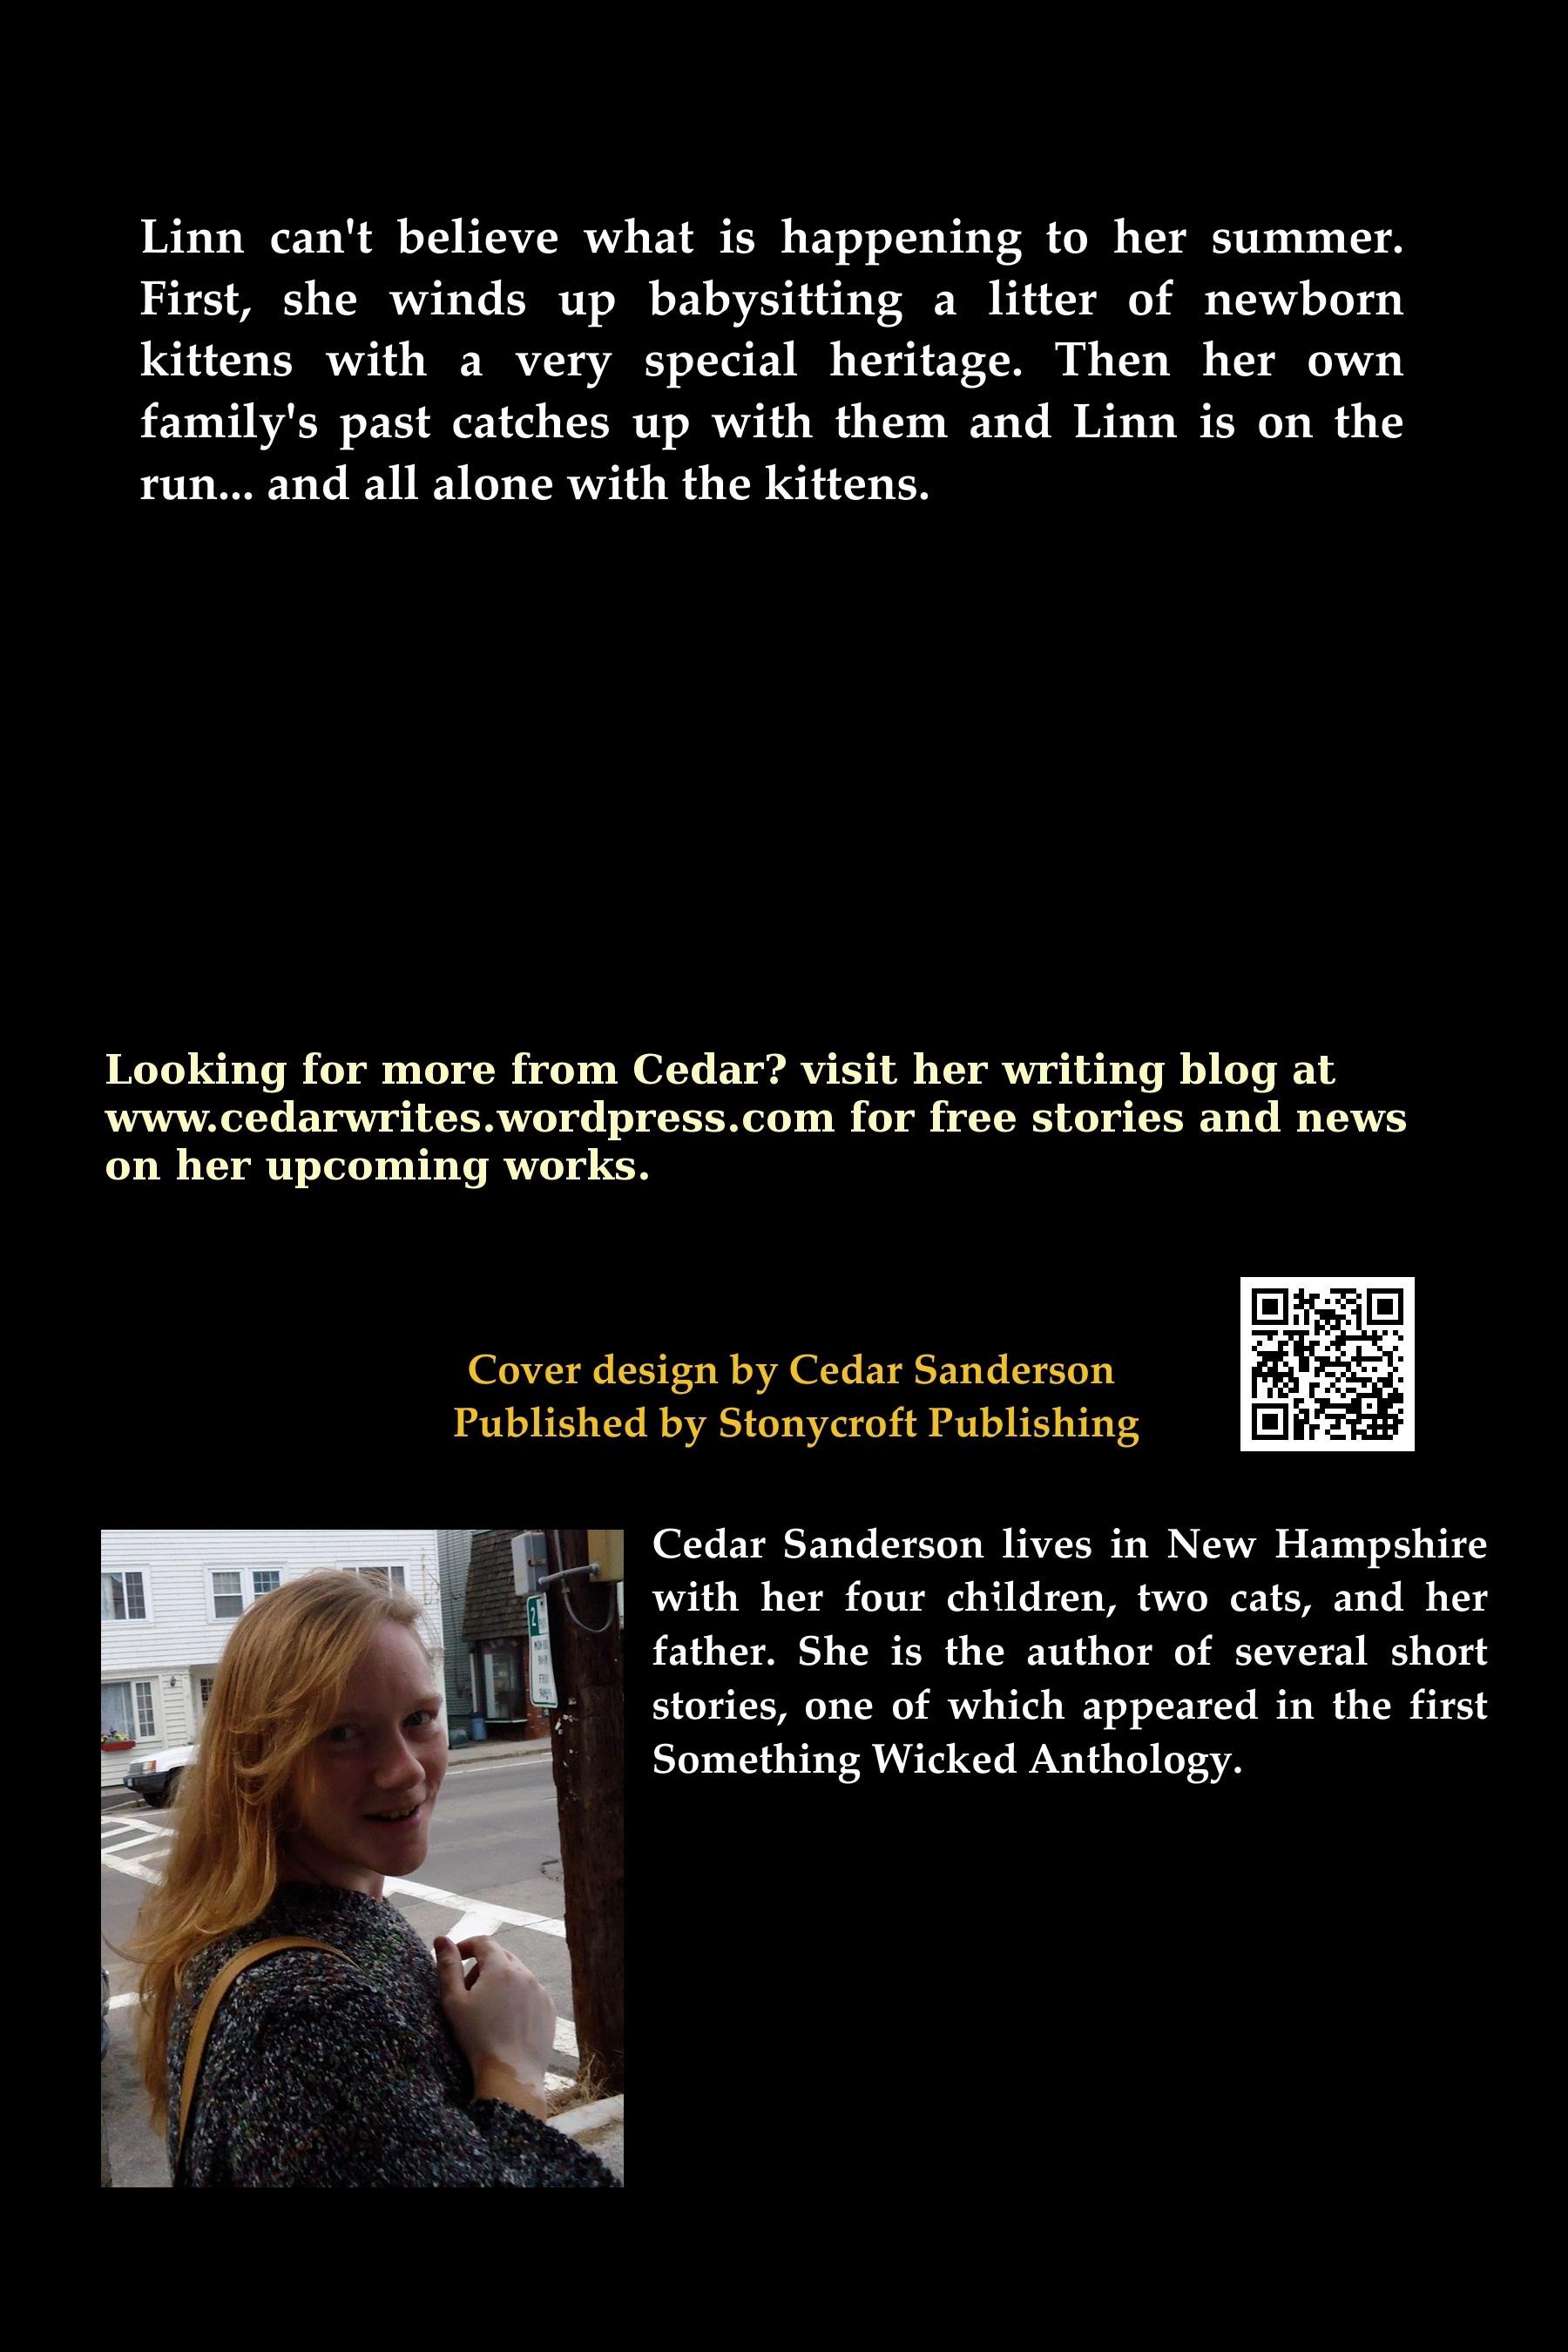 cedar sanderson author, Vulcan's Kittens